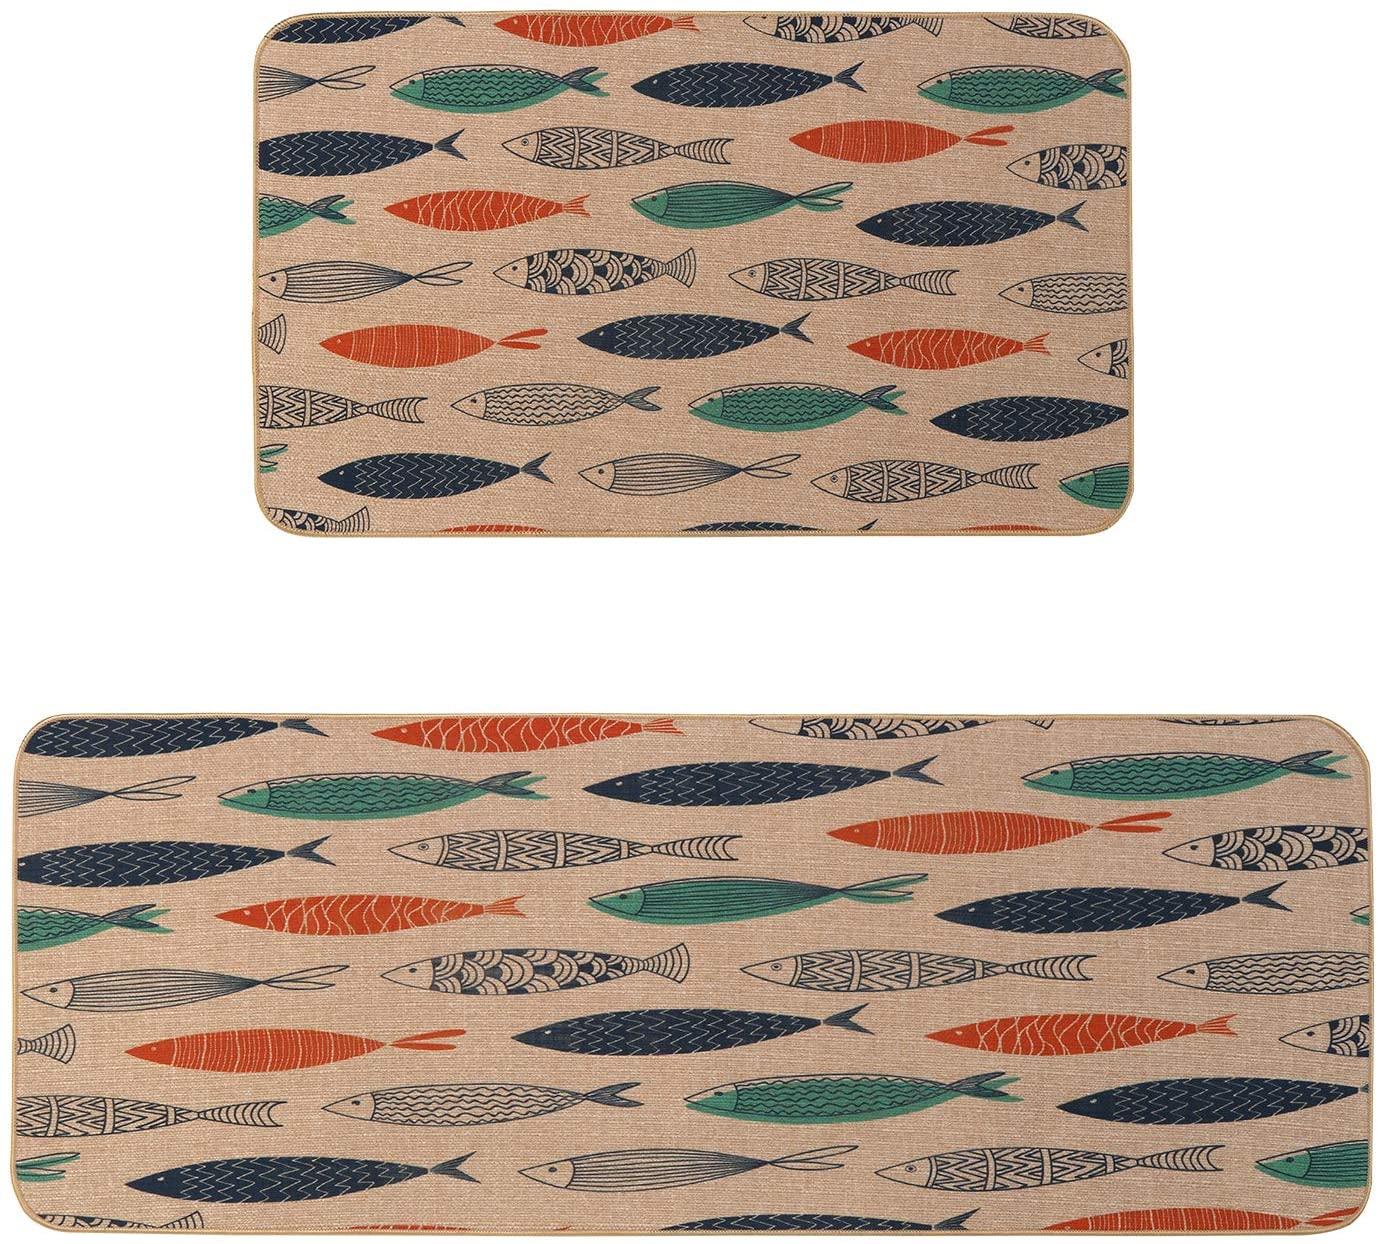 Kitchen Mat Set, KIMODE 2 Piece Microfiber Kitchen Rugs Cushioned Chef Soft Non-Slip Rubber Back Floor Mats Washable Doormat Bathroom Runner Area Rug Carpet (18